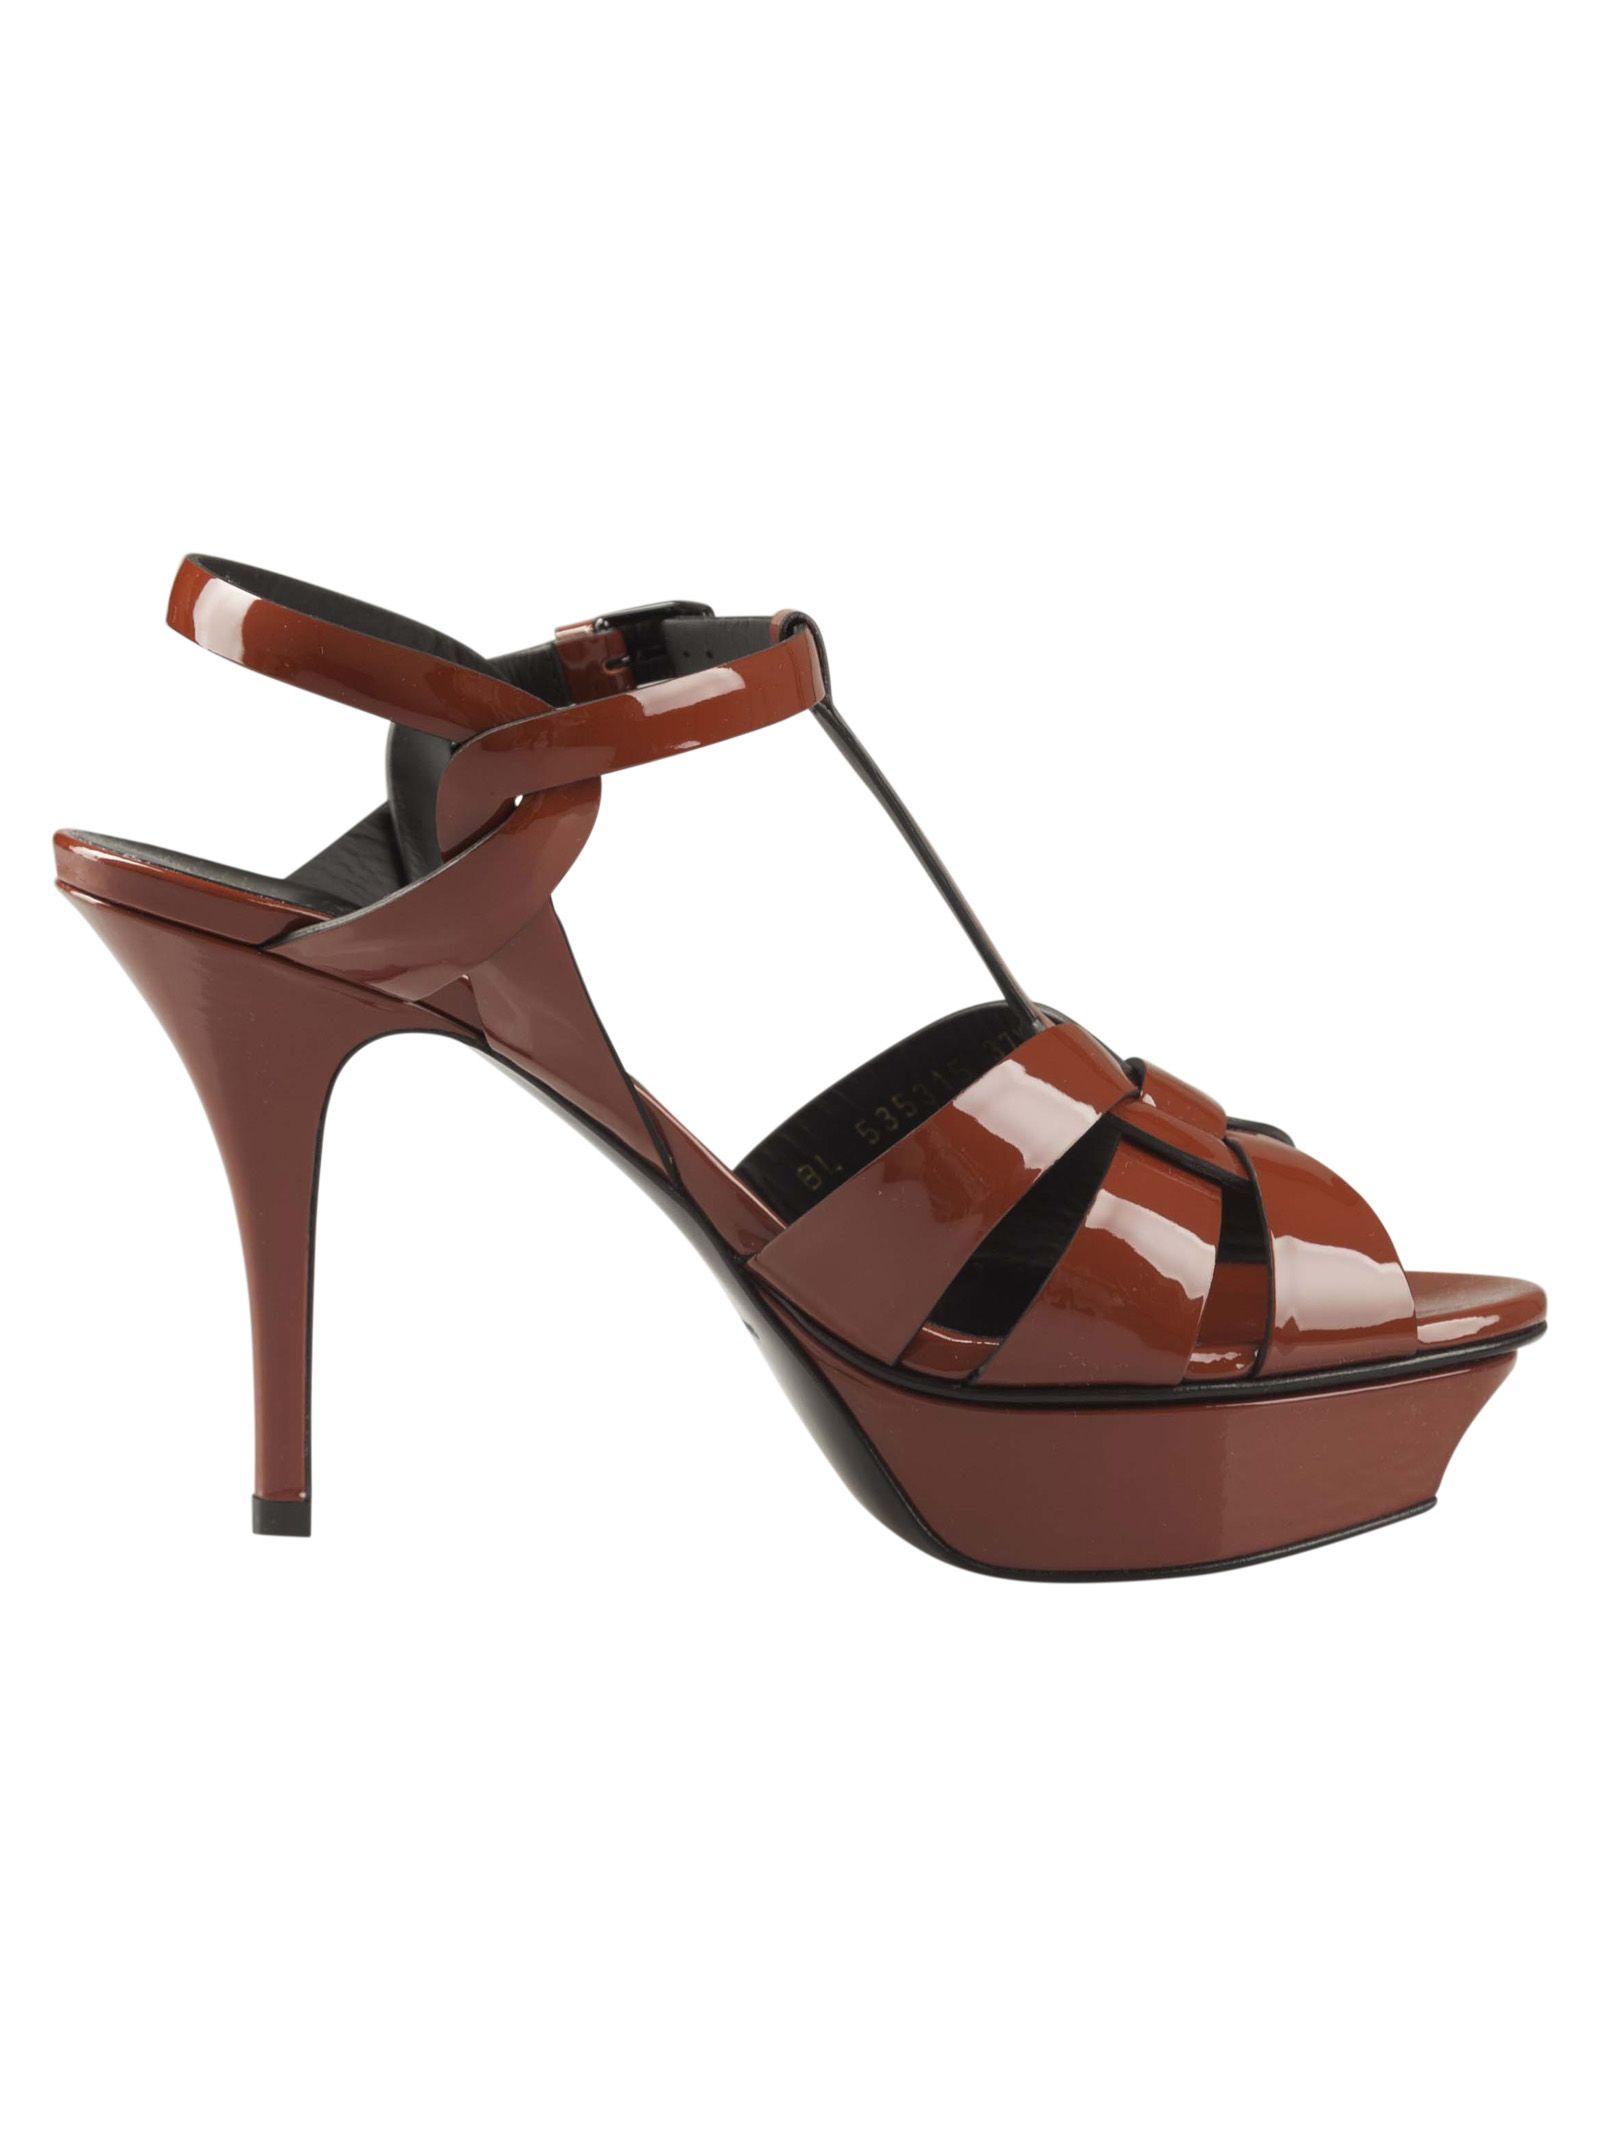 Saint Laurent Tribute 105 Wedge Sandals